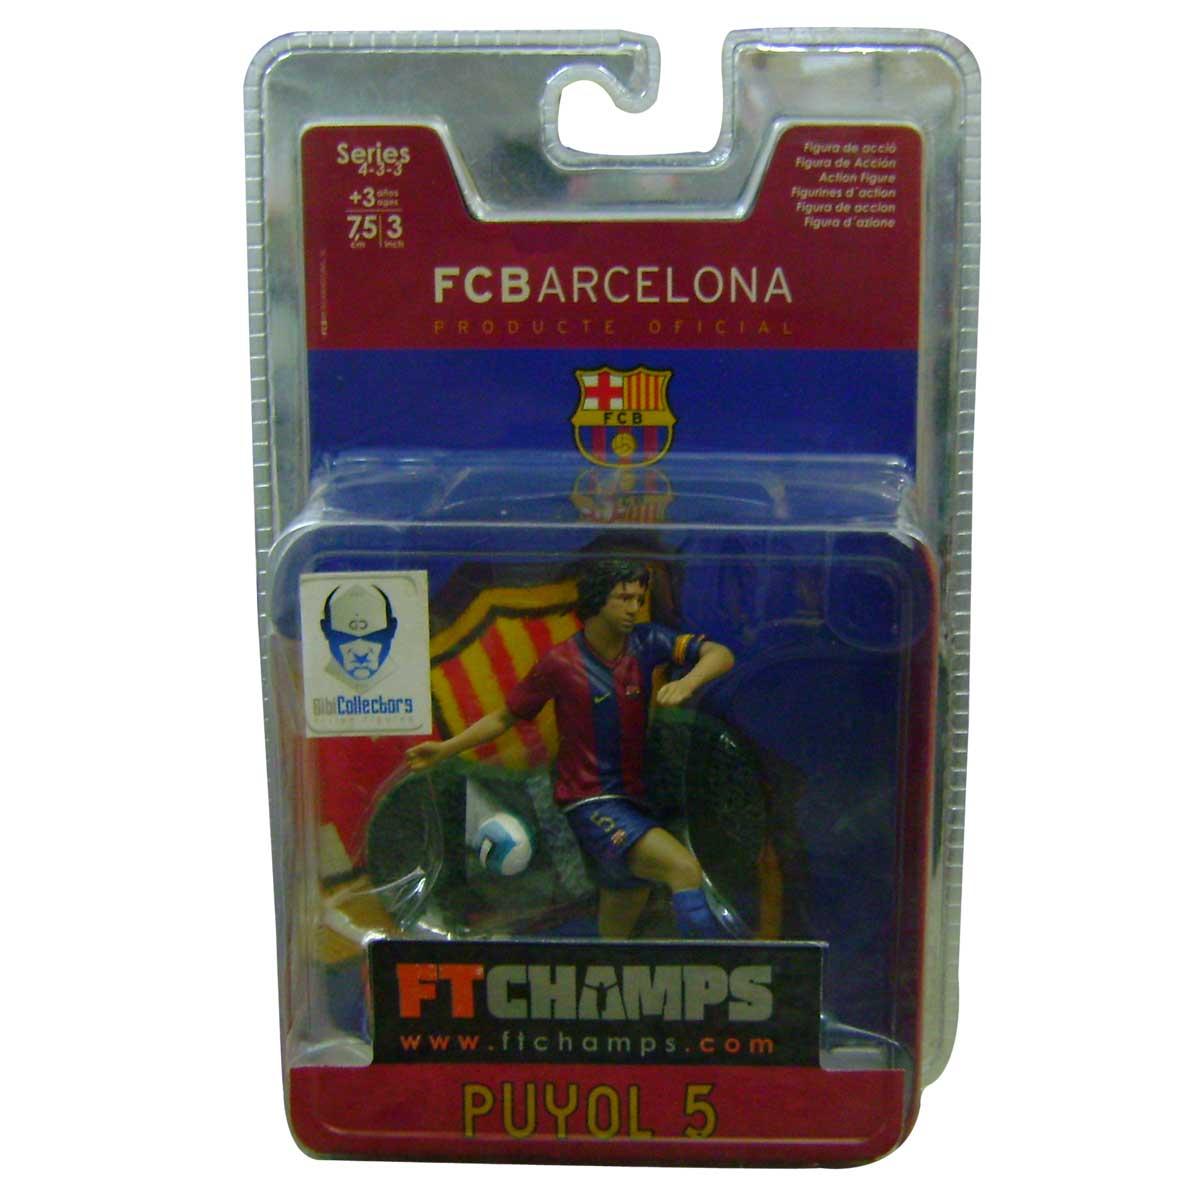 Minicraque Caricatura do Puyol FC Barcelona - FTChamps